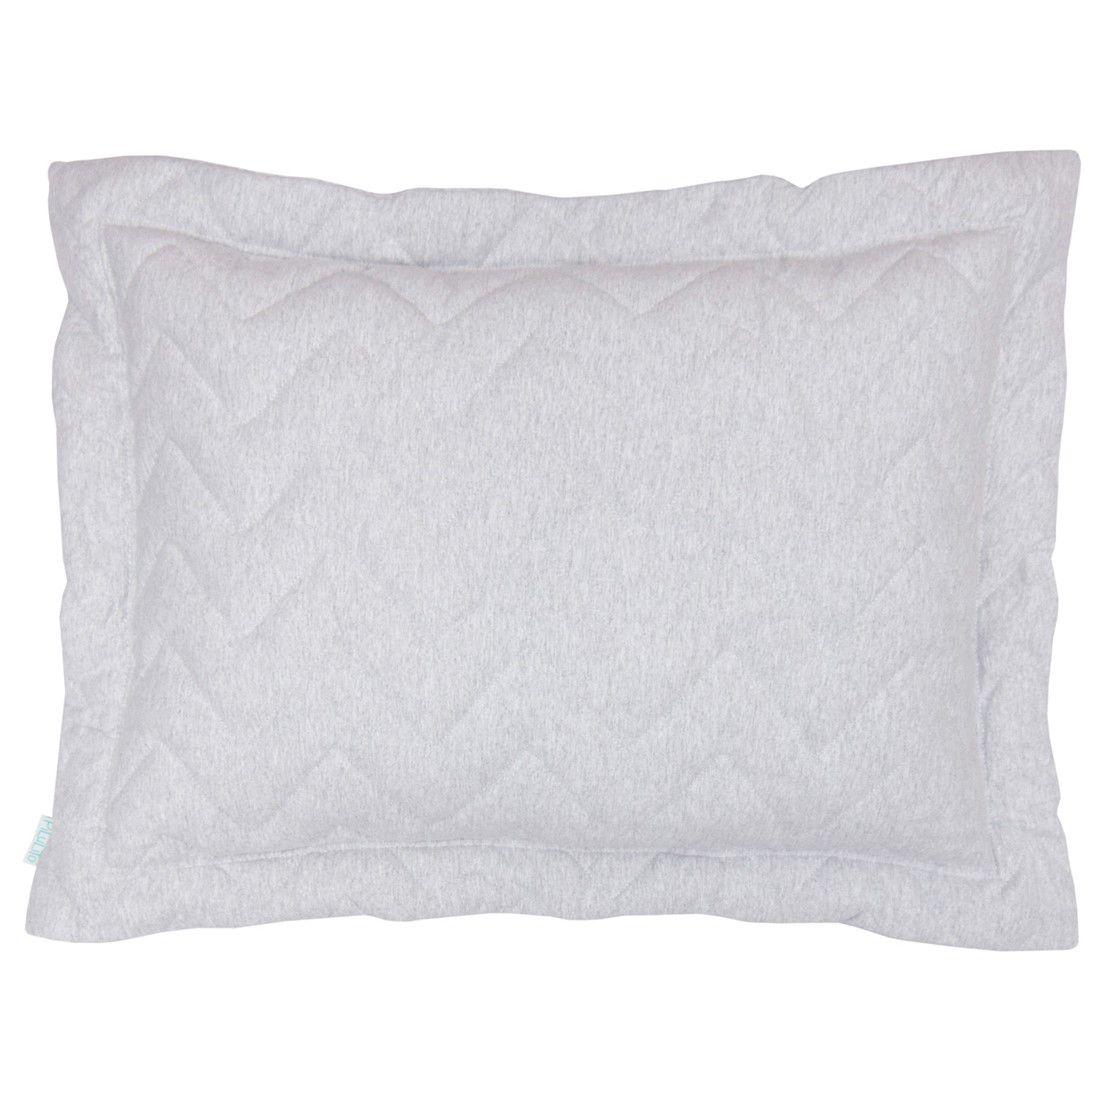 Porta travesseiro em malha chevron 70x50cm cinza mescla